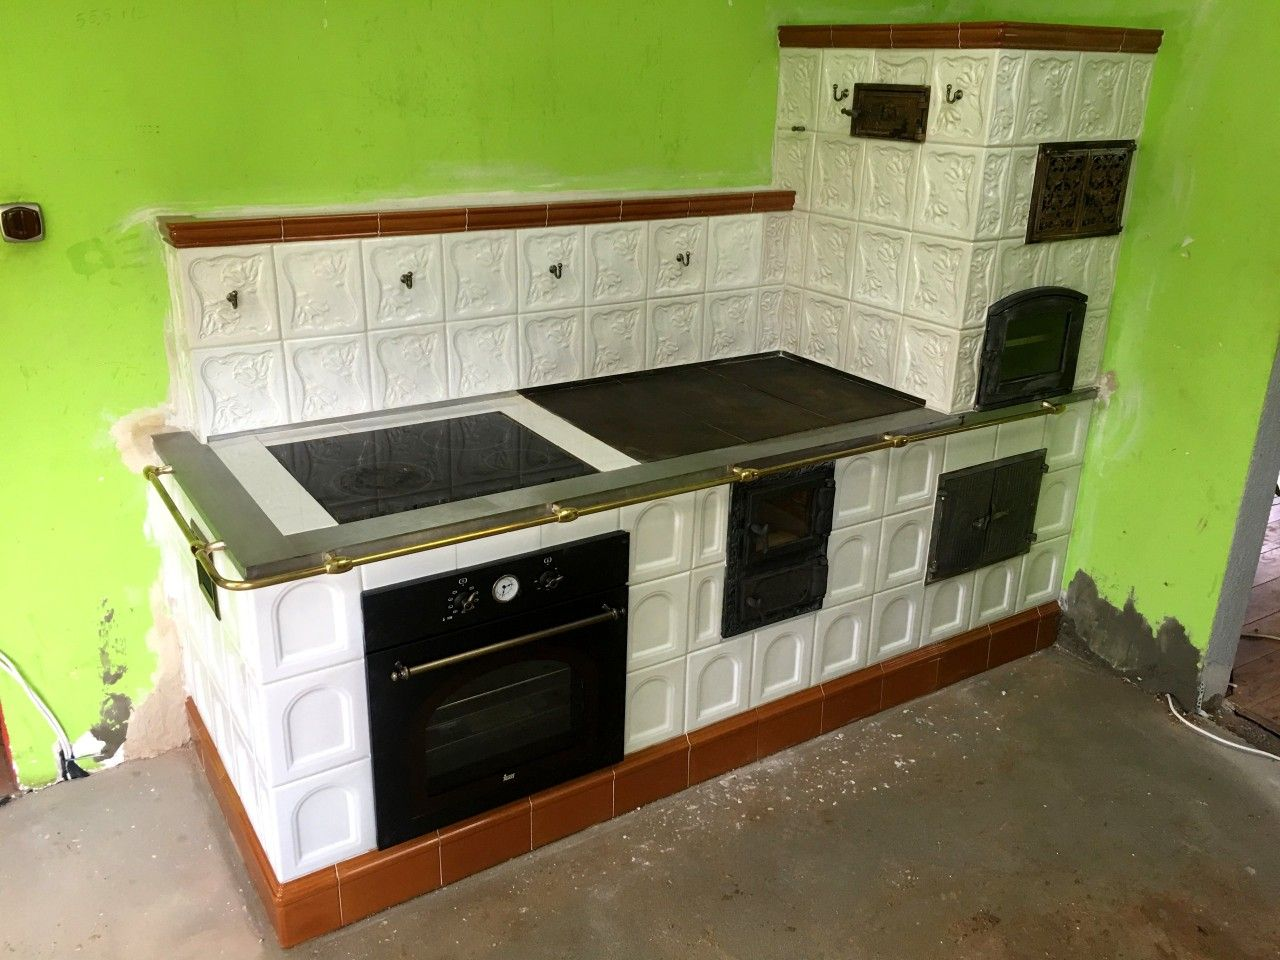 Kuchnia Kaflowa Wall Oven Double Wall Oven Kitchen Appliances